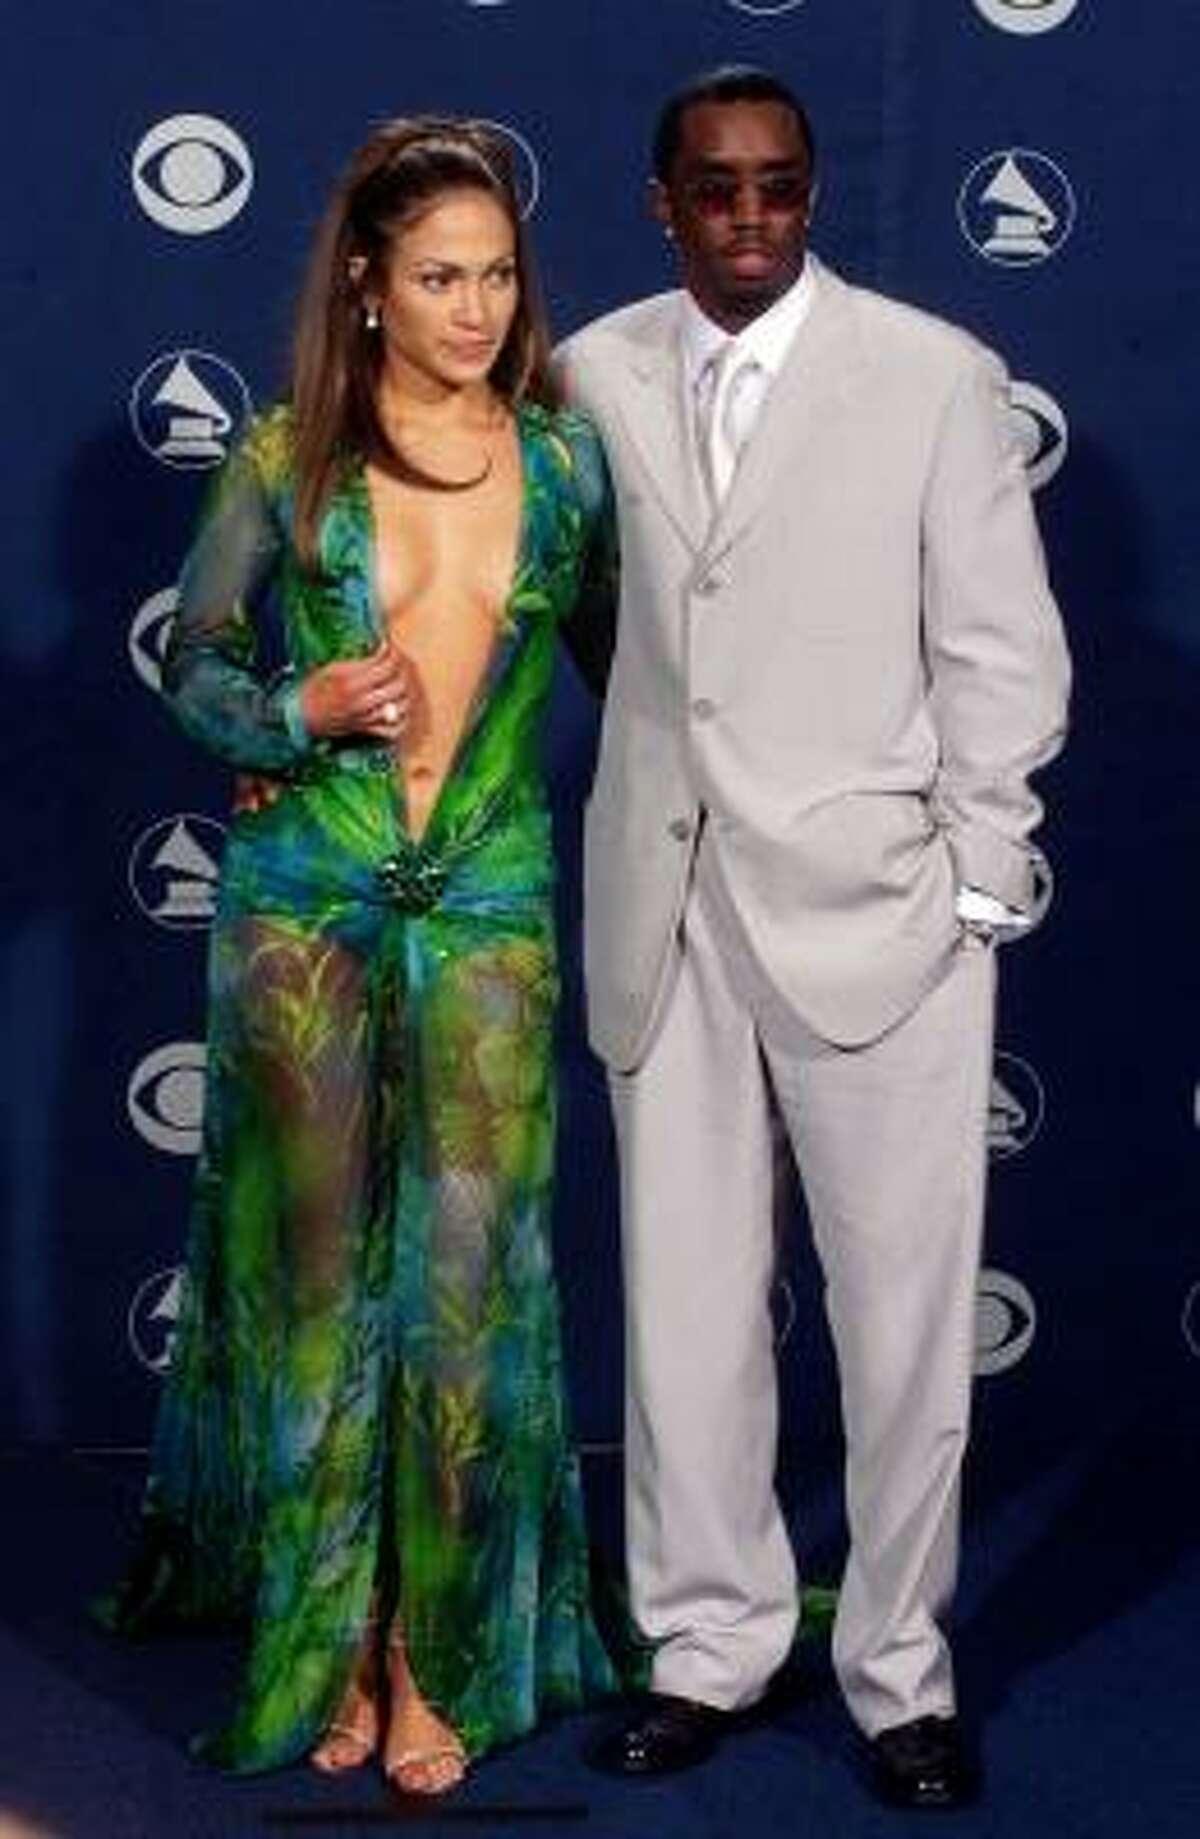 Jennifer Lopez's dress at the 2000 Grammys set the bar for celebrities